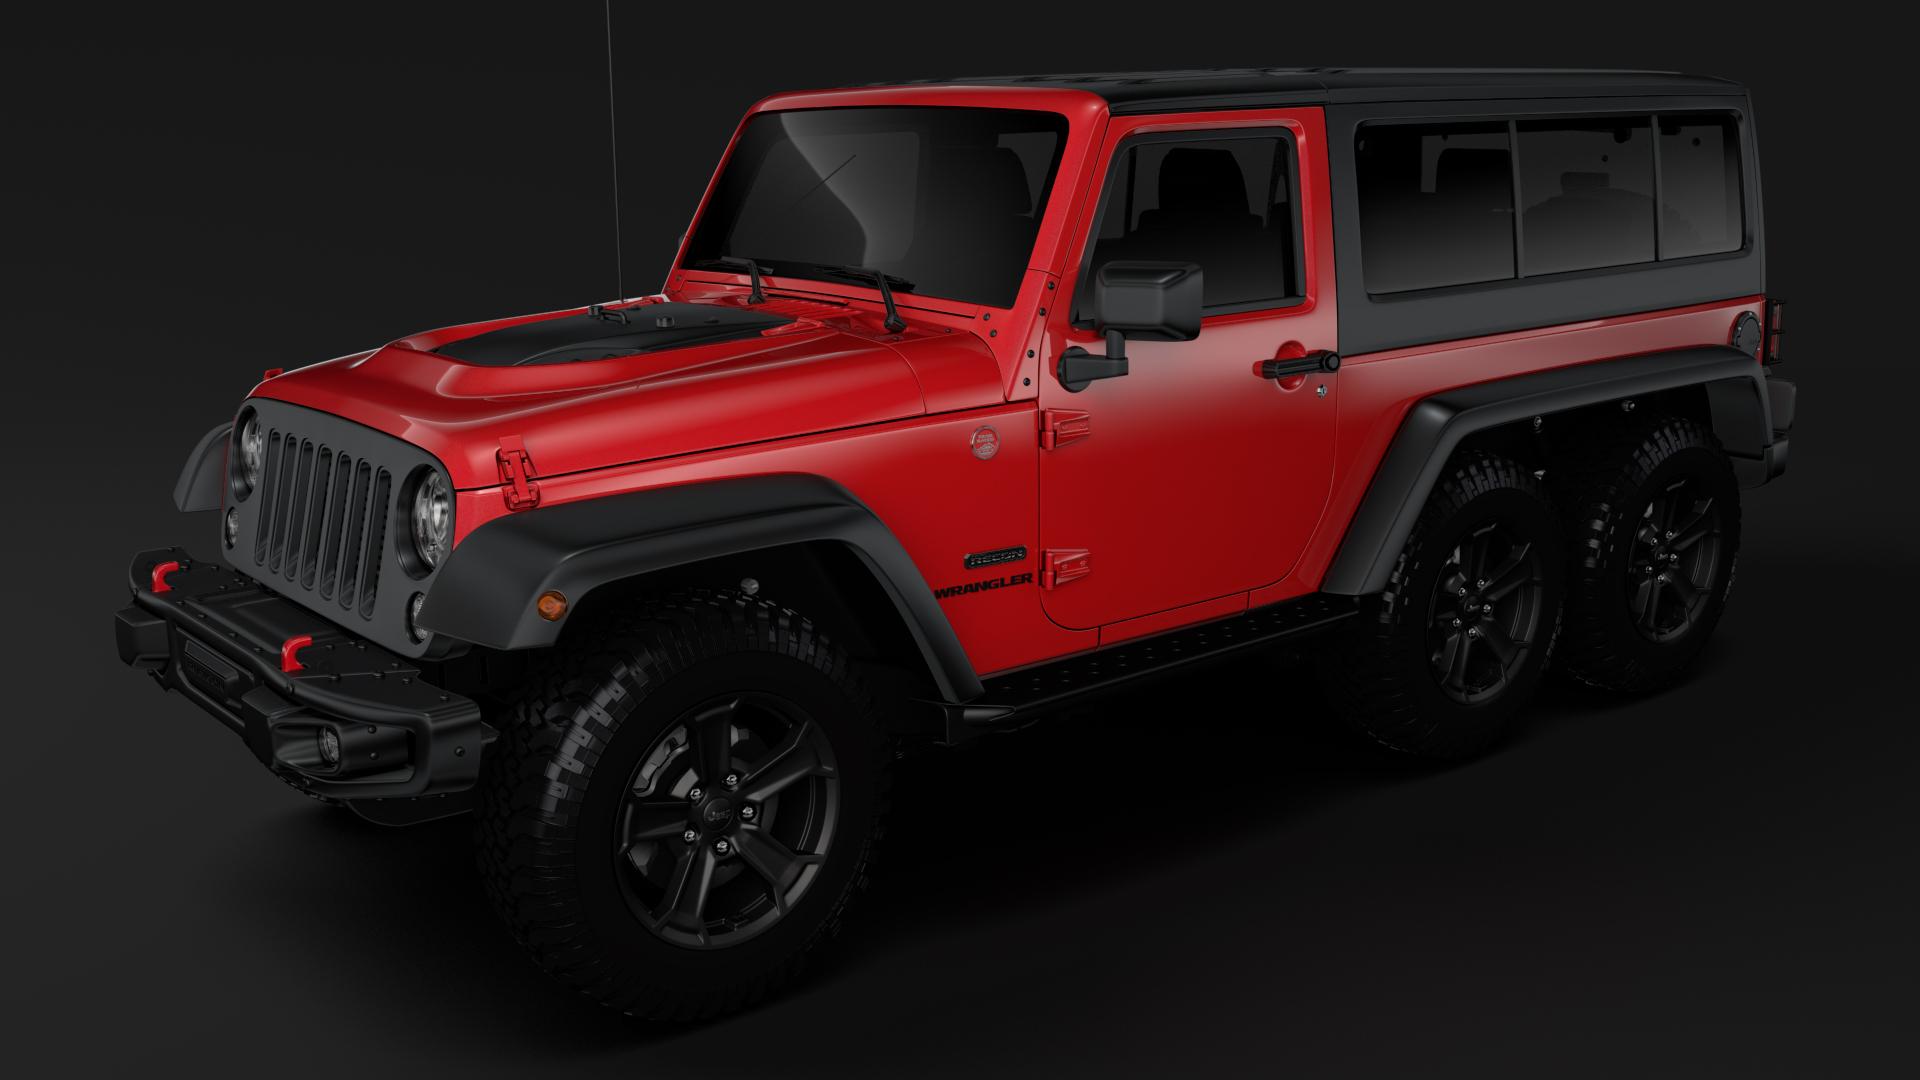 jeep wrangler 6×6 rubicon recon jk 2017 3d model max fbx c4d lwo ma mb hrc xsi obj 276842